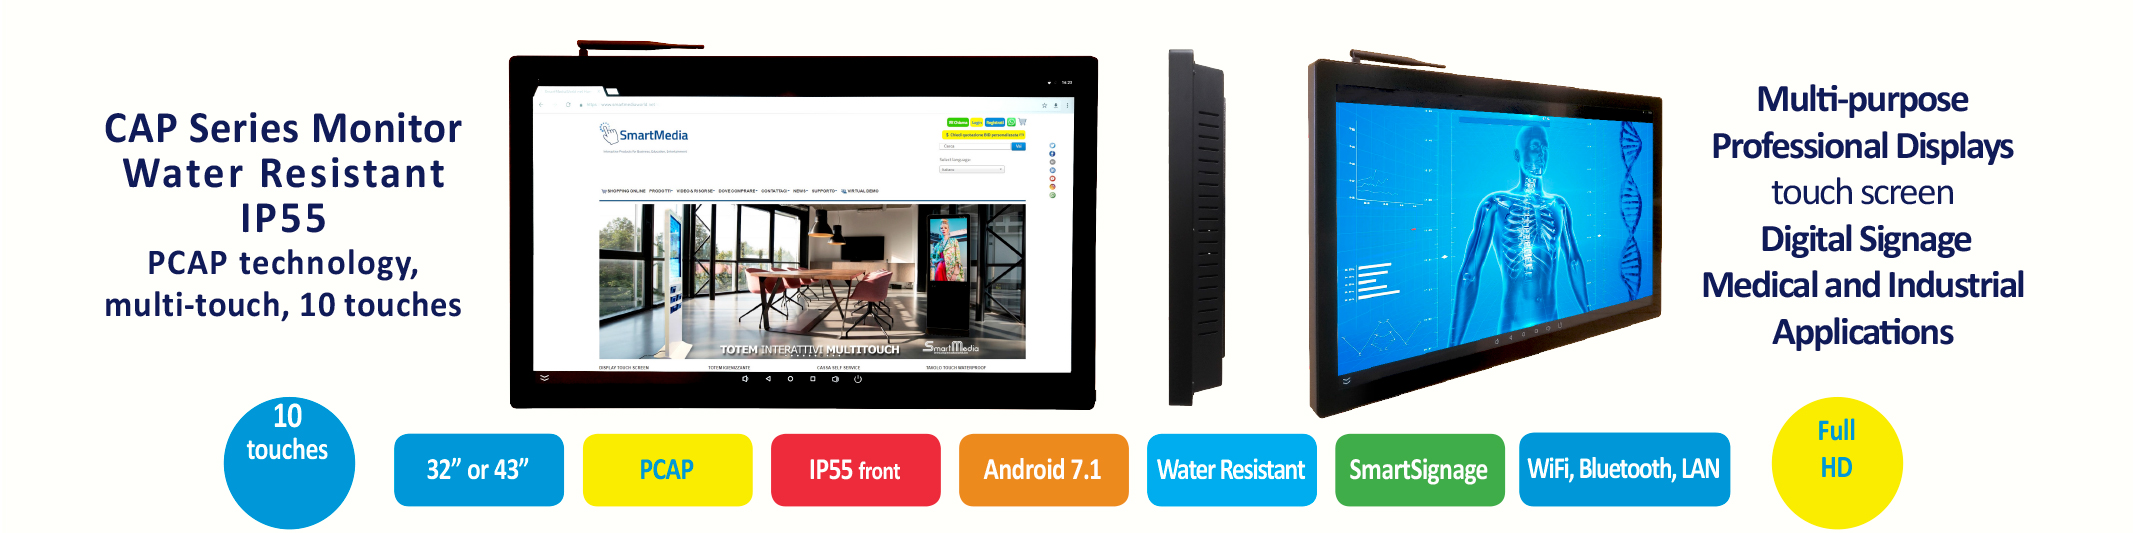 Monitor CAP Series | Display touch Screen PCAP